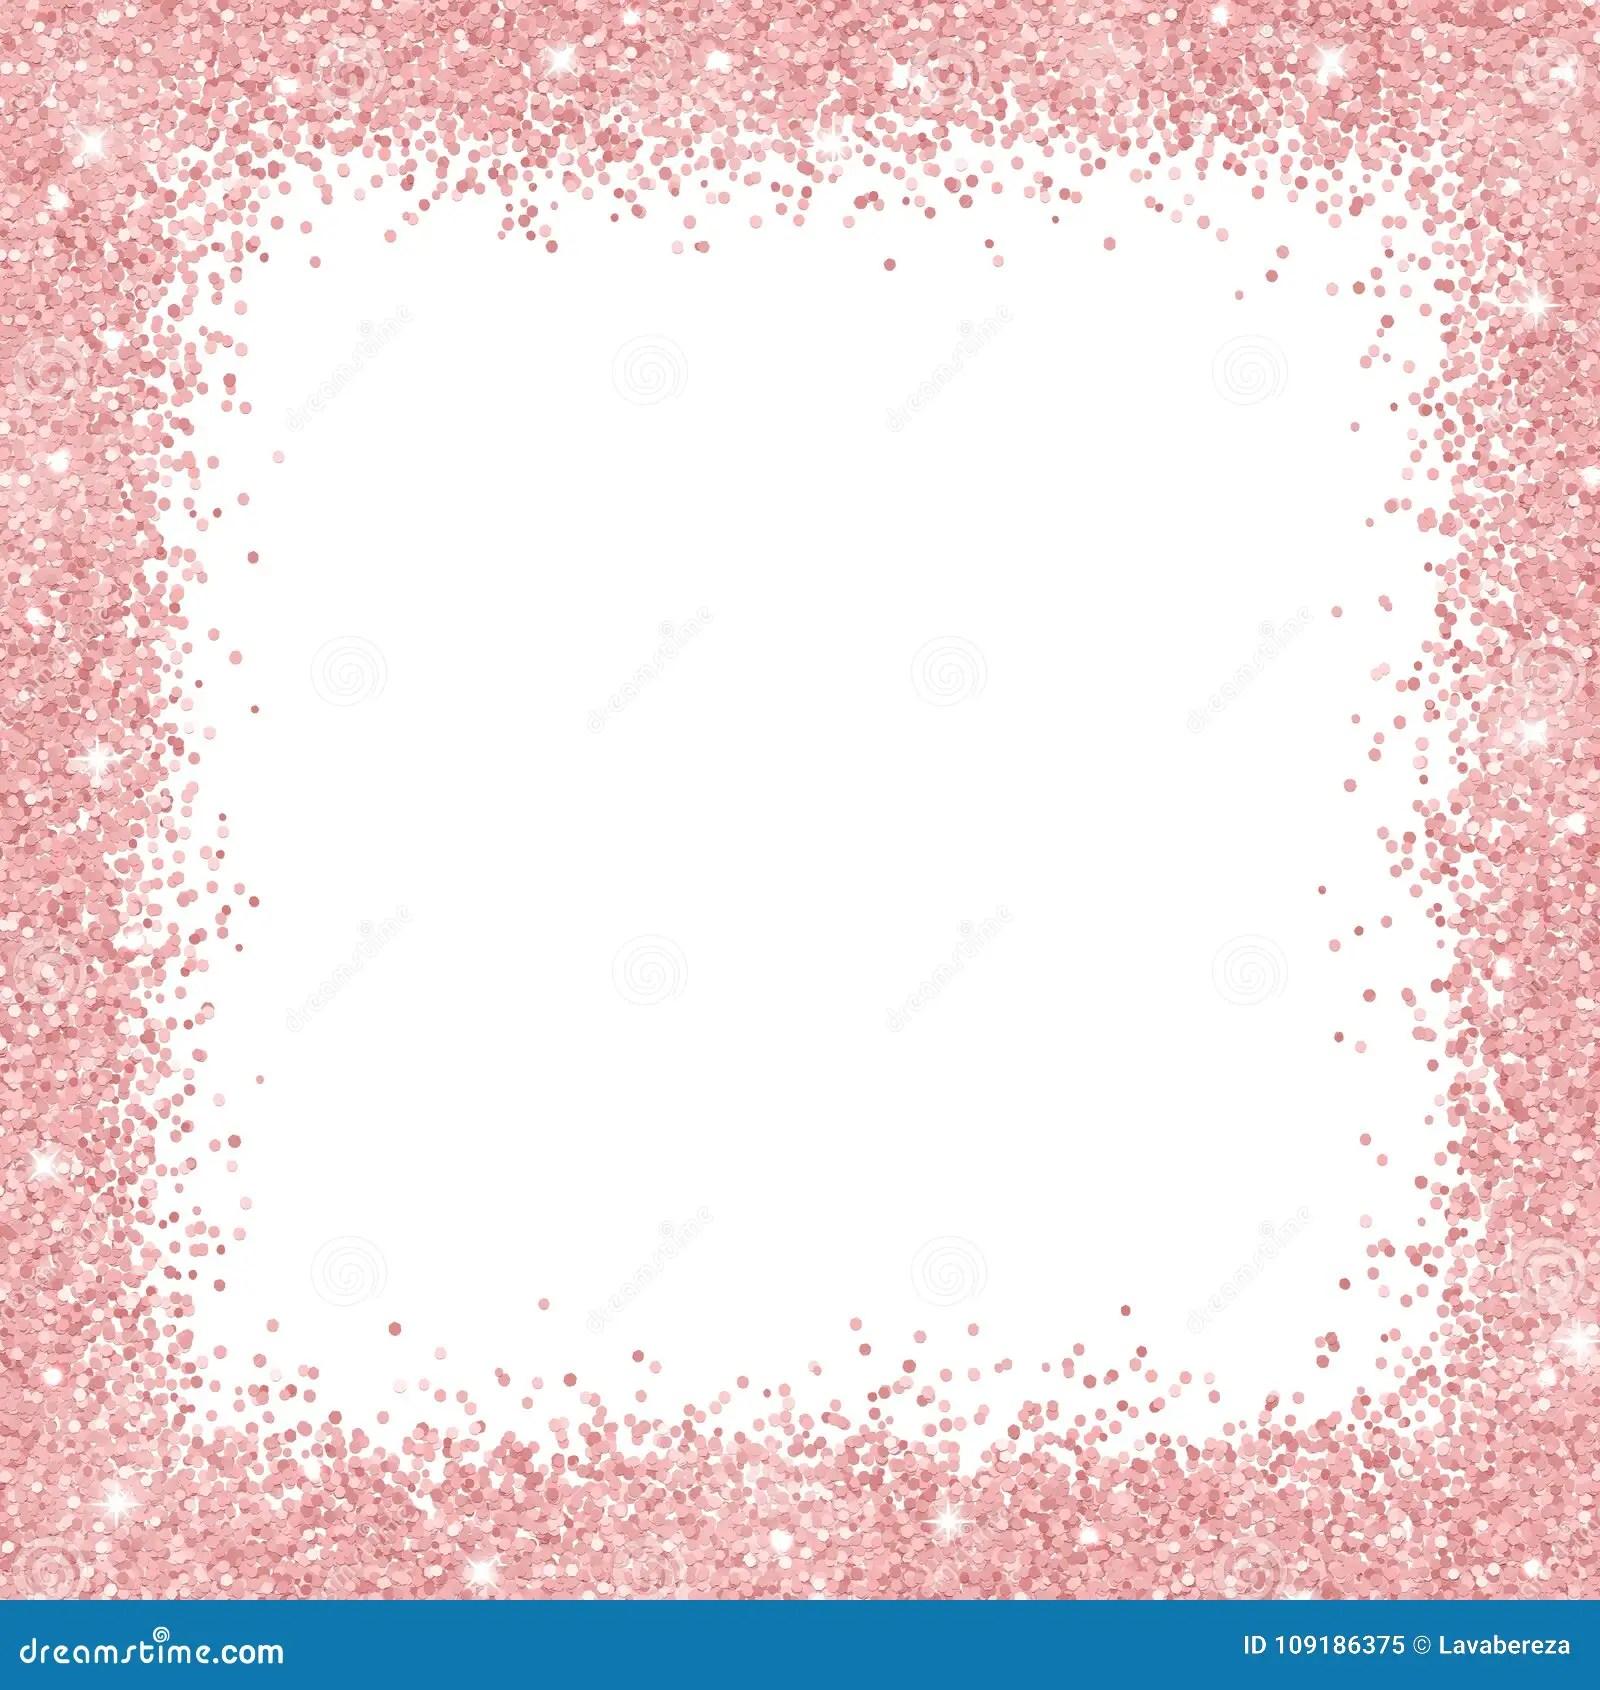 Cute Line Wallpaper Border Frame With Rose Gold Glitter On White Background